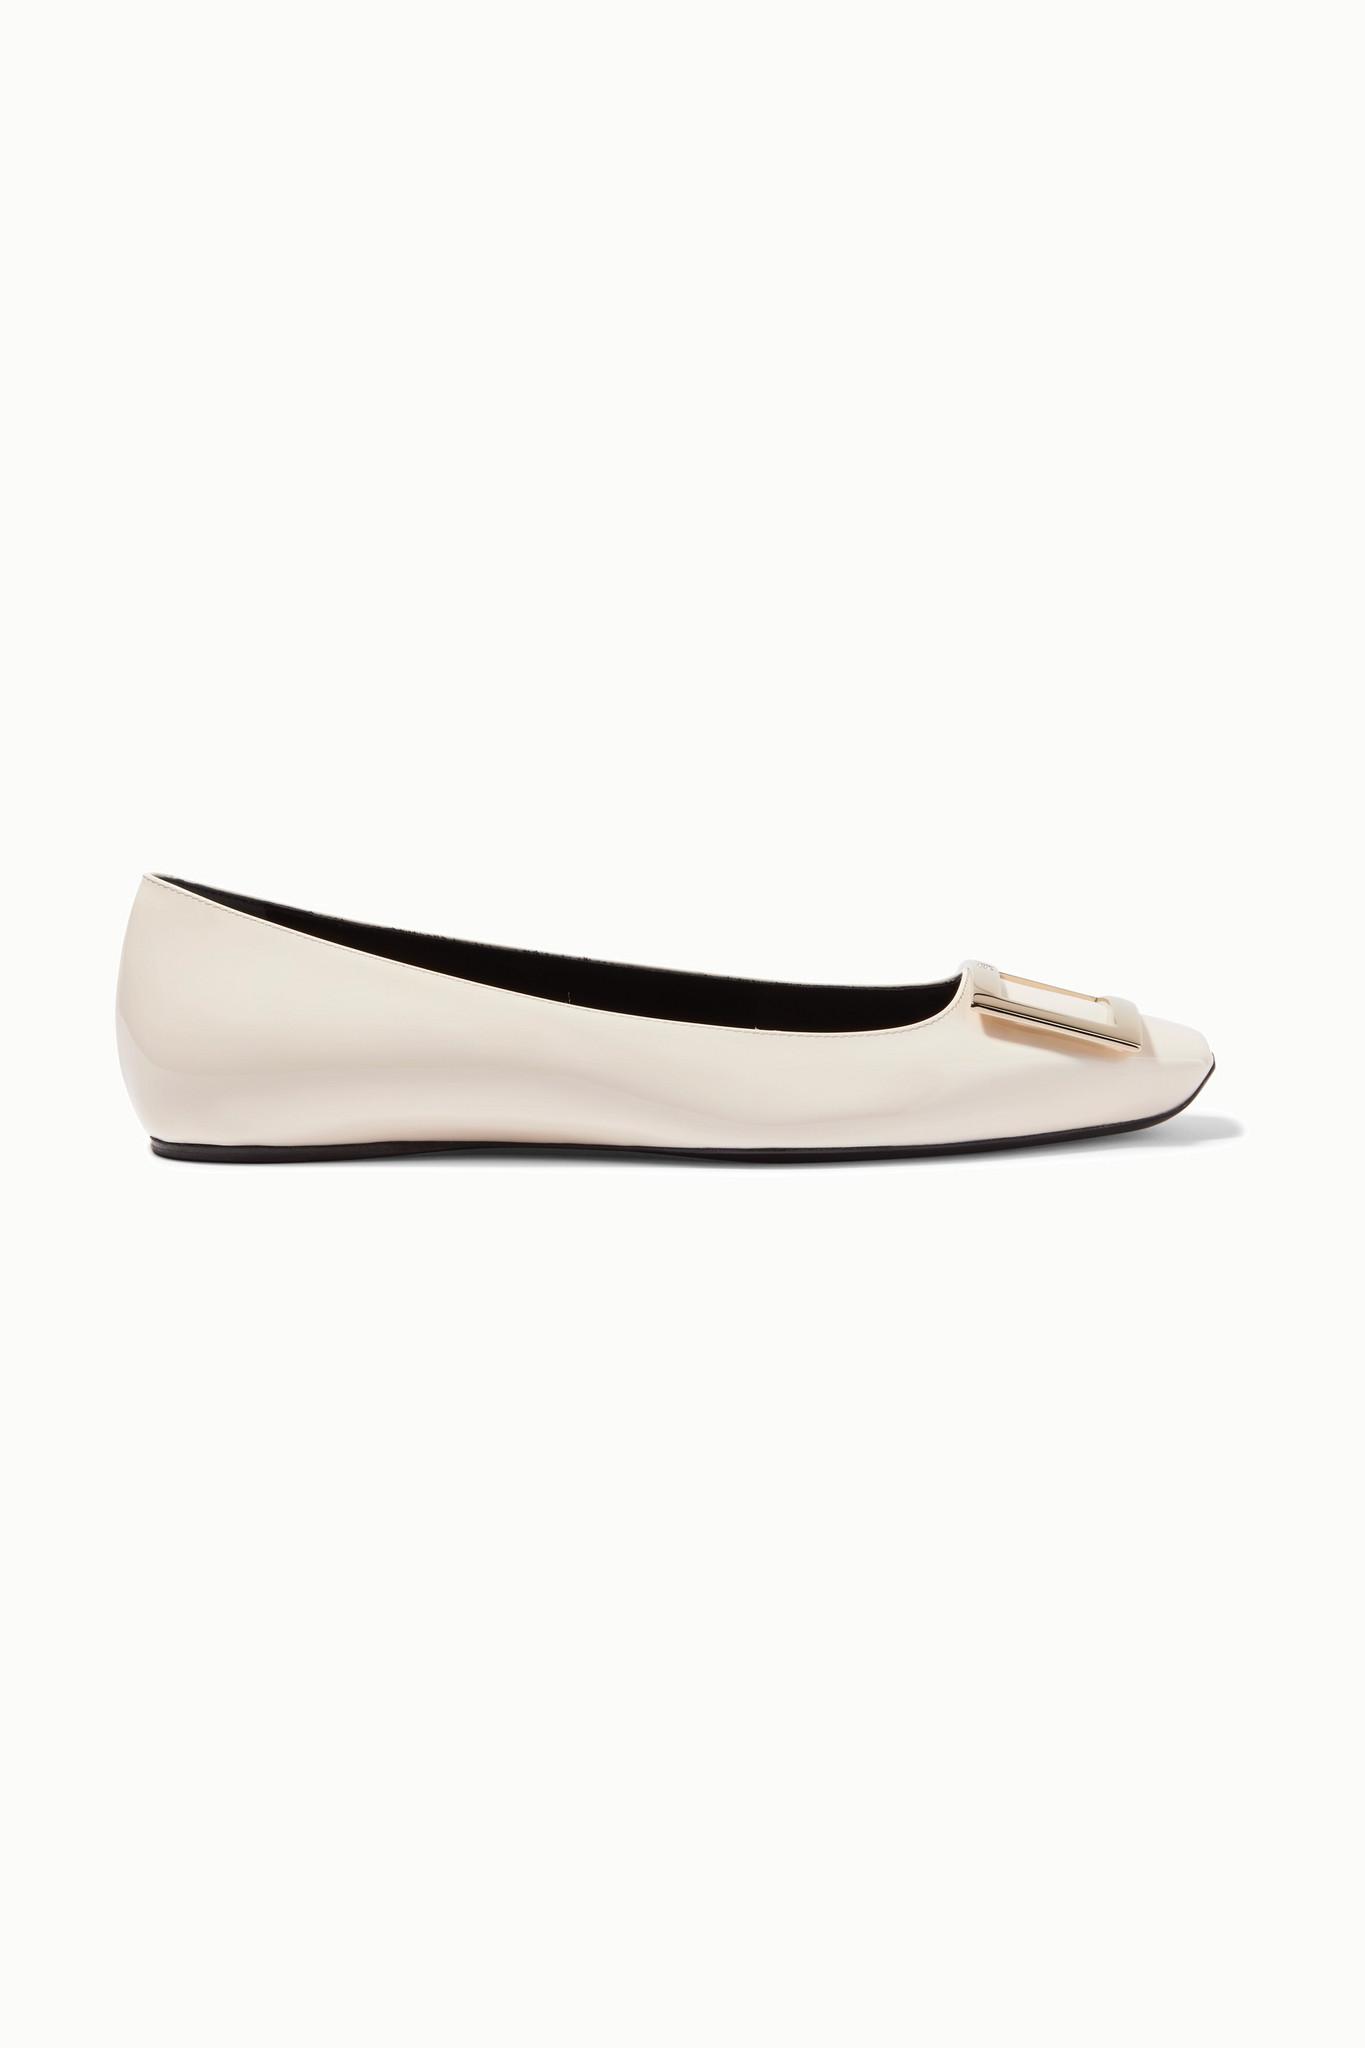 ROGER VIVIER - Trompette Bellerine Patent-leather Ballet Flats - White - IT38.5